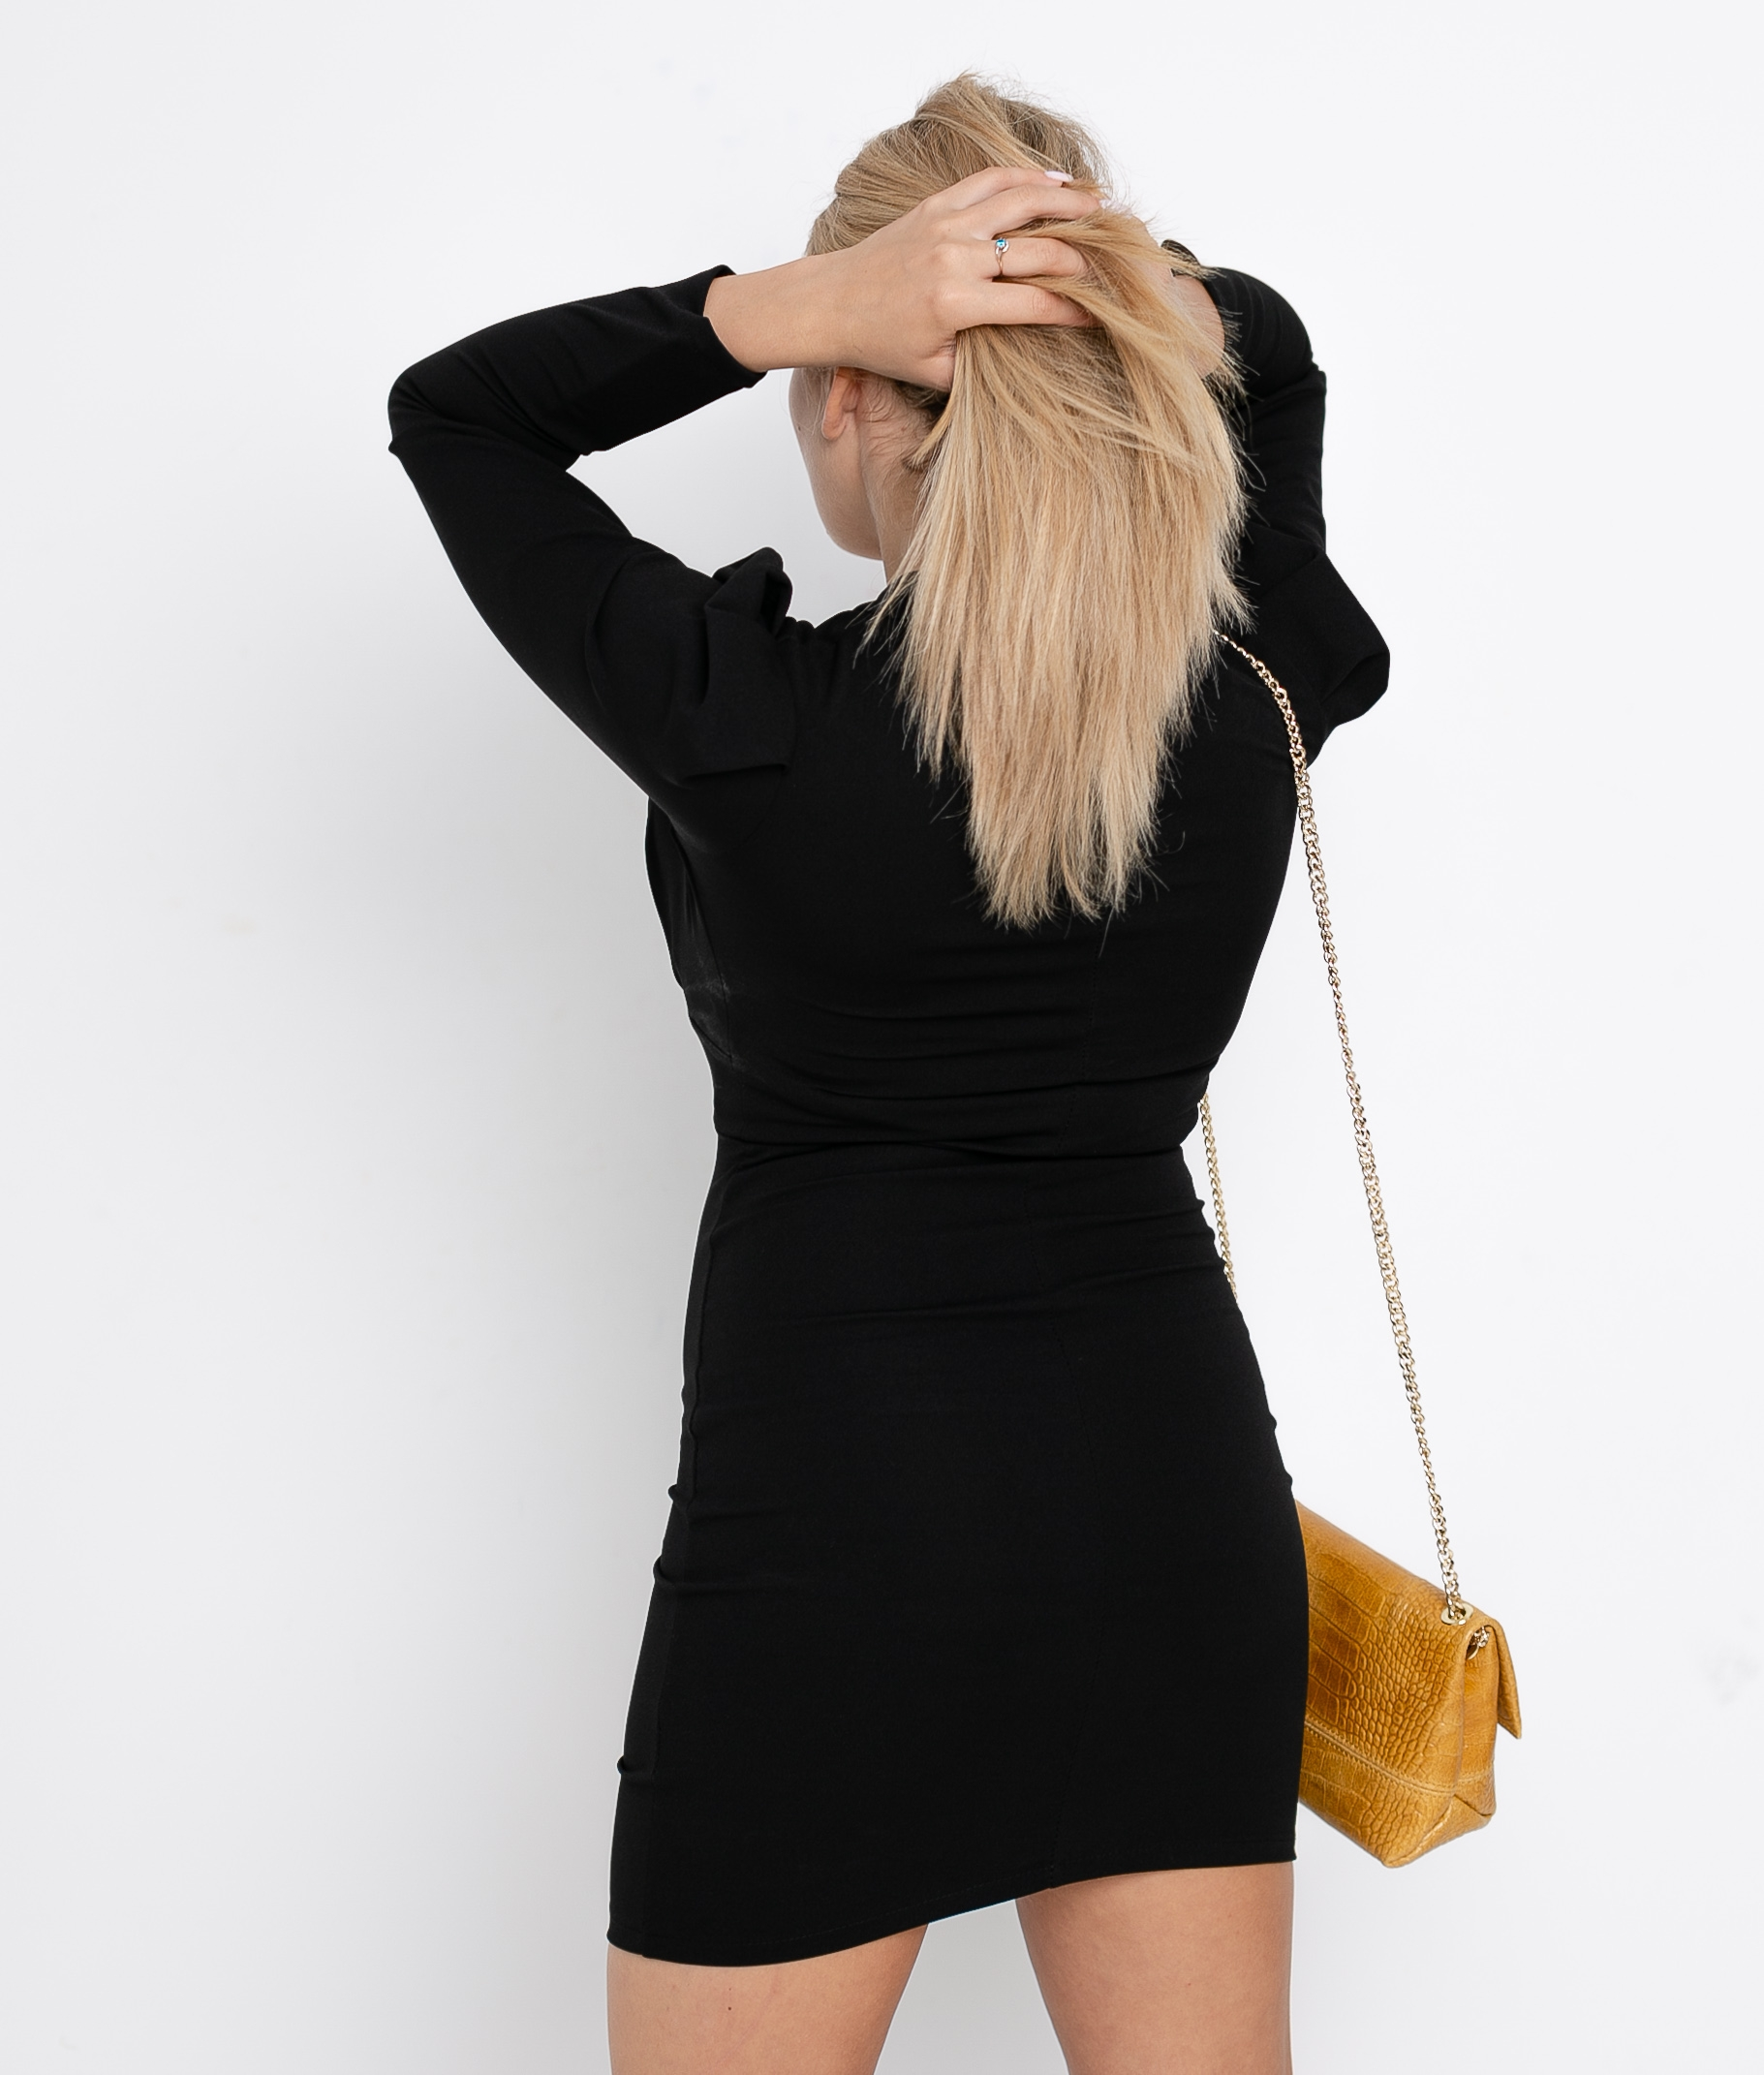 FICTION DRESS - BLACK